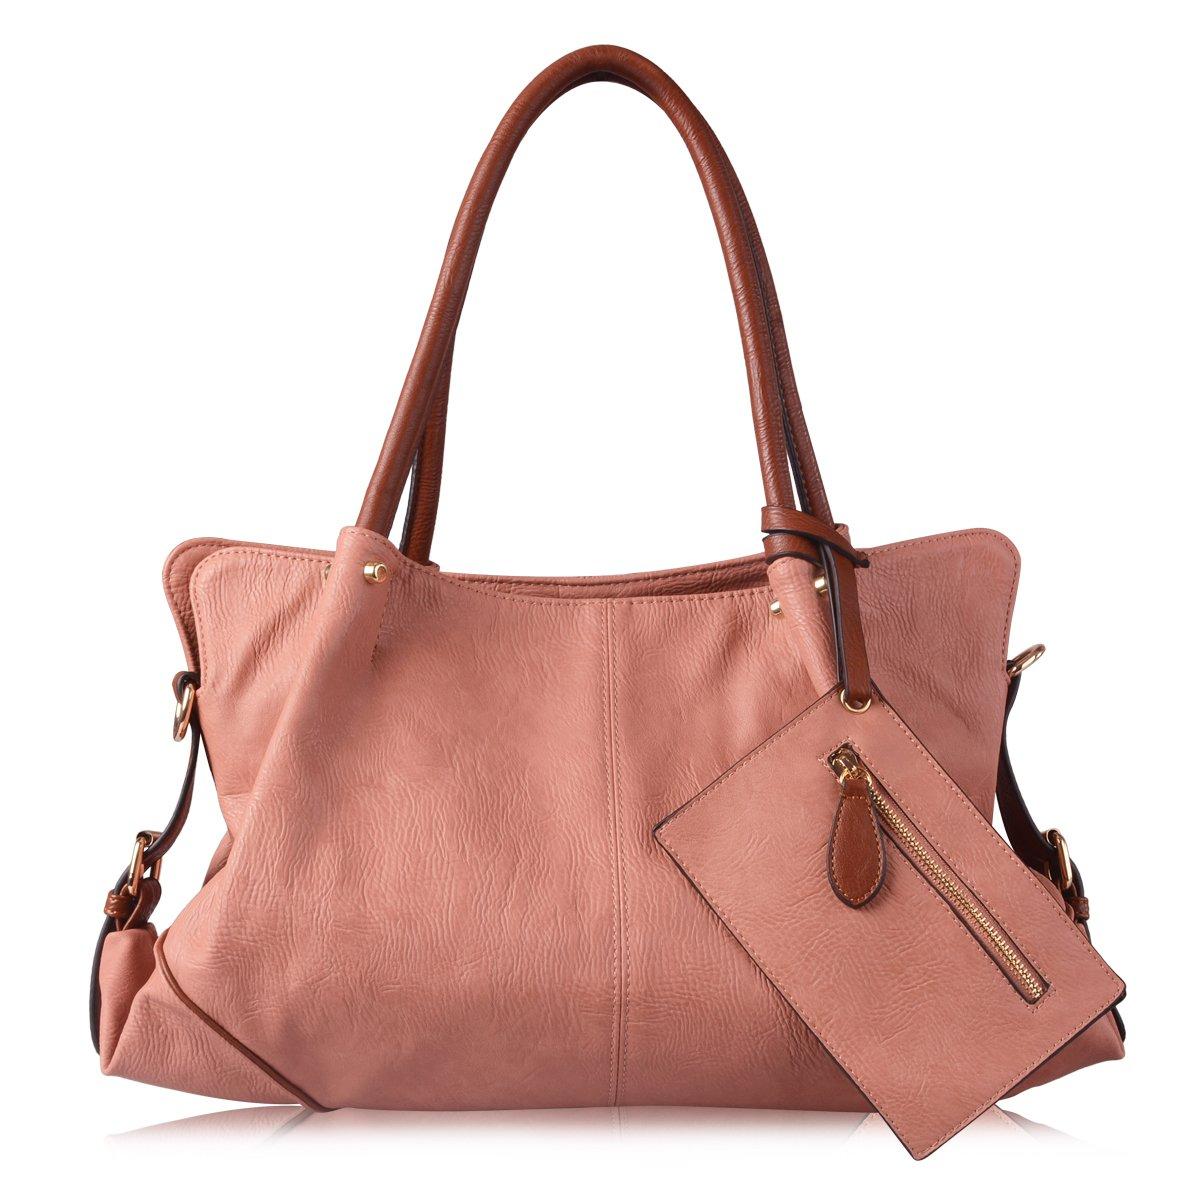 AB Earth 3 Pieces Women Hobo Handbag PU Leather Totes Matching Wallet Satchel Shoulder Bag, M898 (Pink)